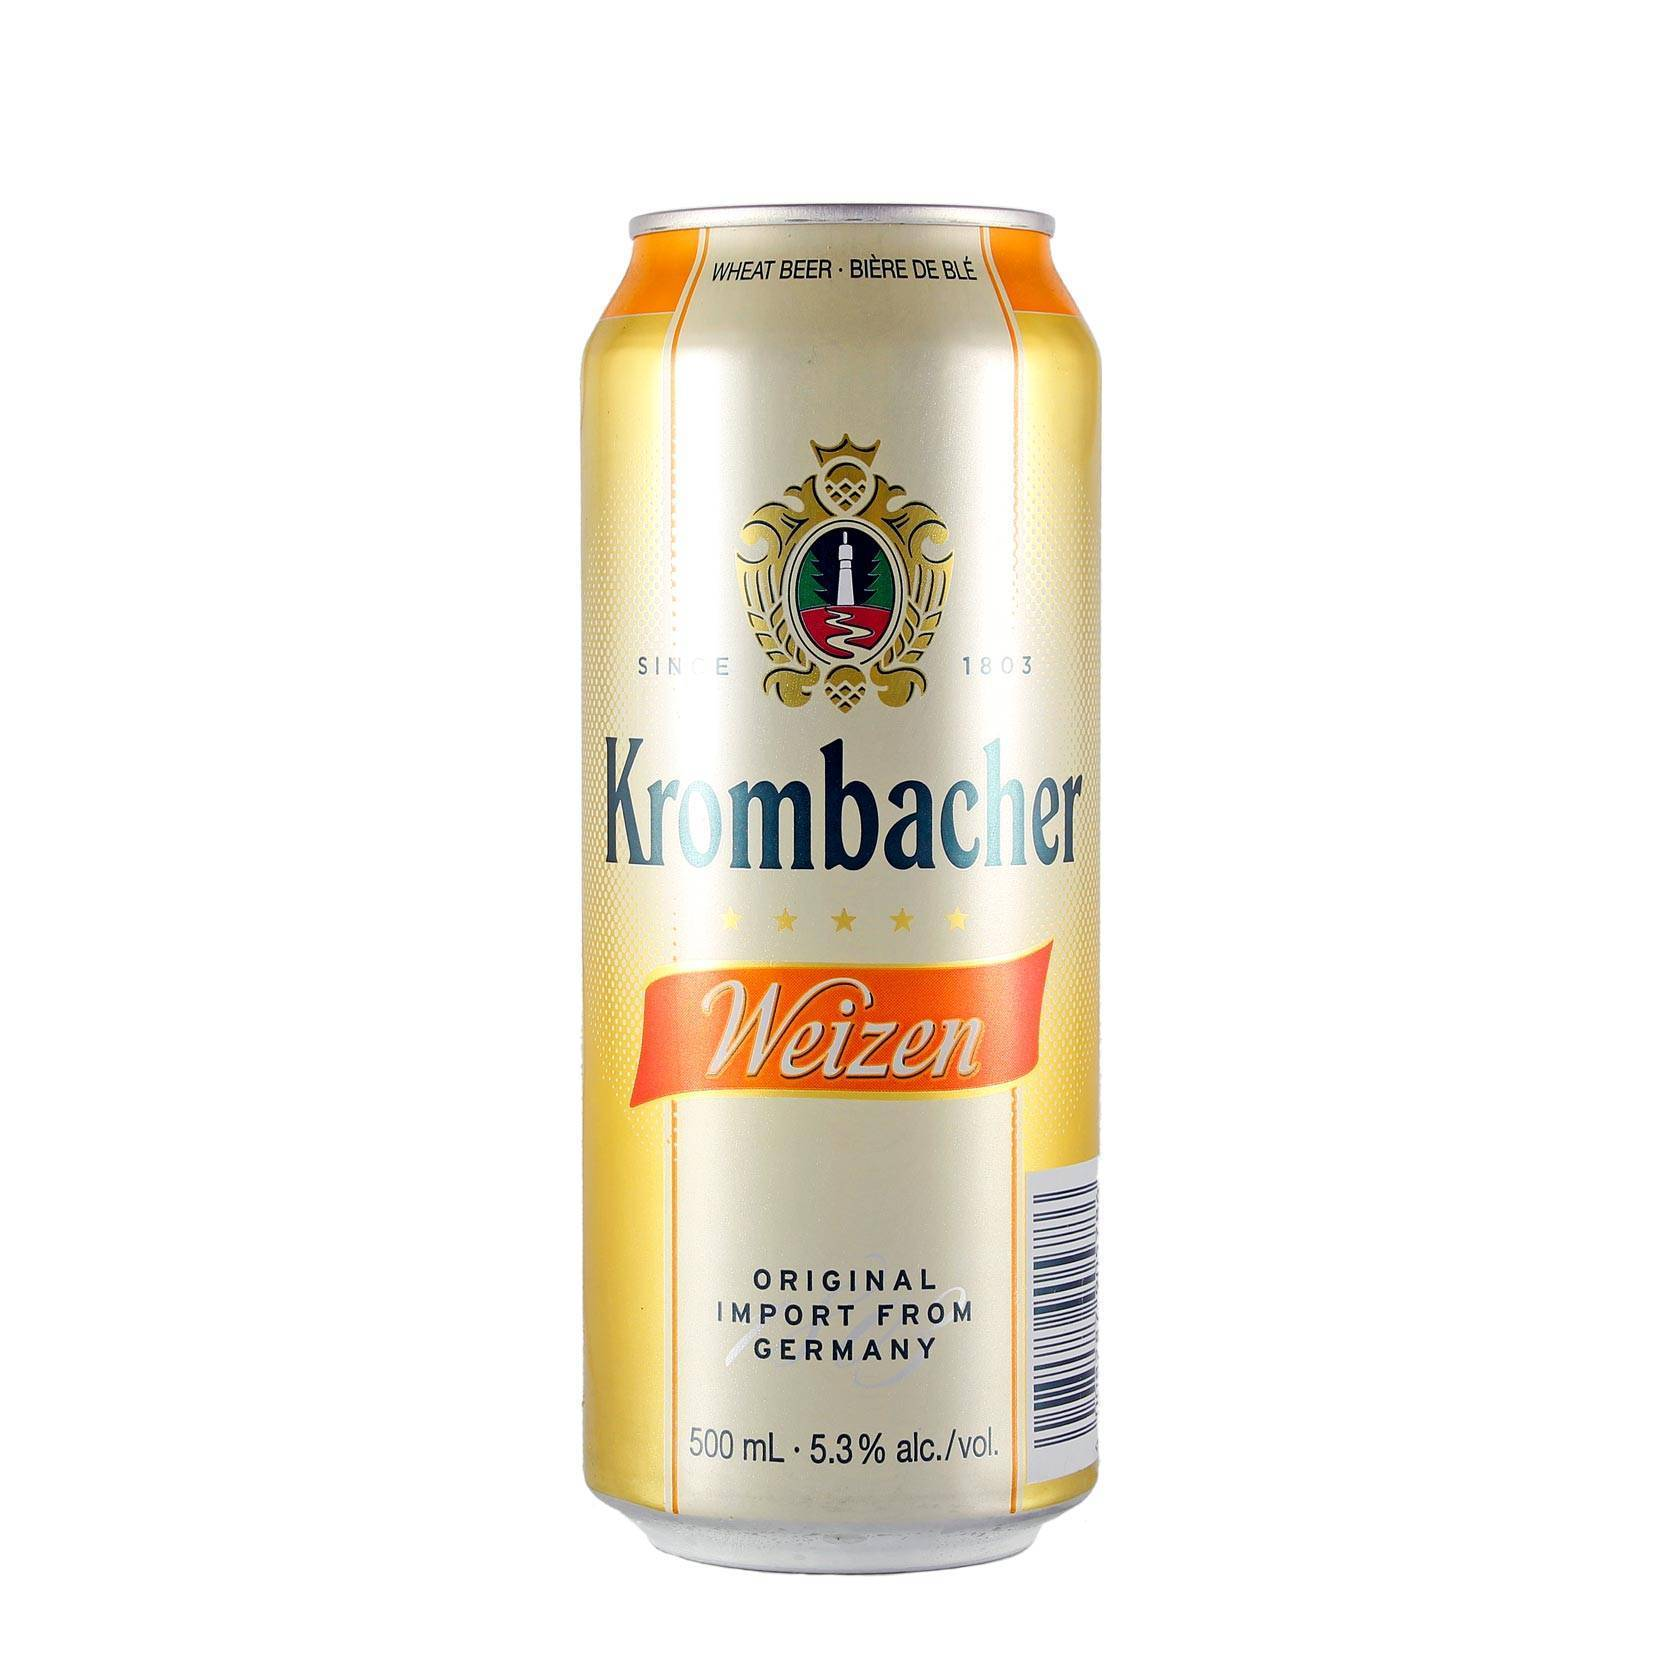 Пиво krombacher, weizen, 0.5 л — кромбахер, вайцен, 500 мл